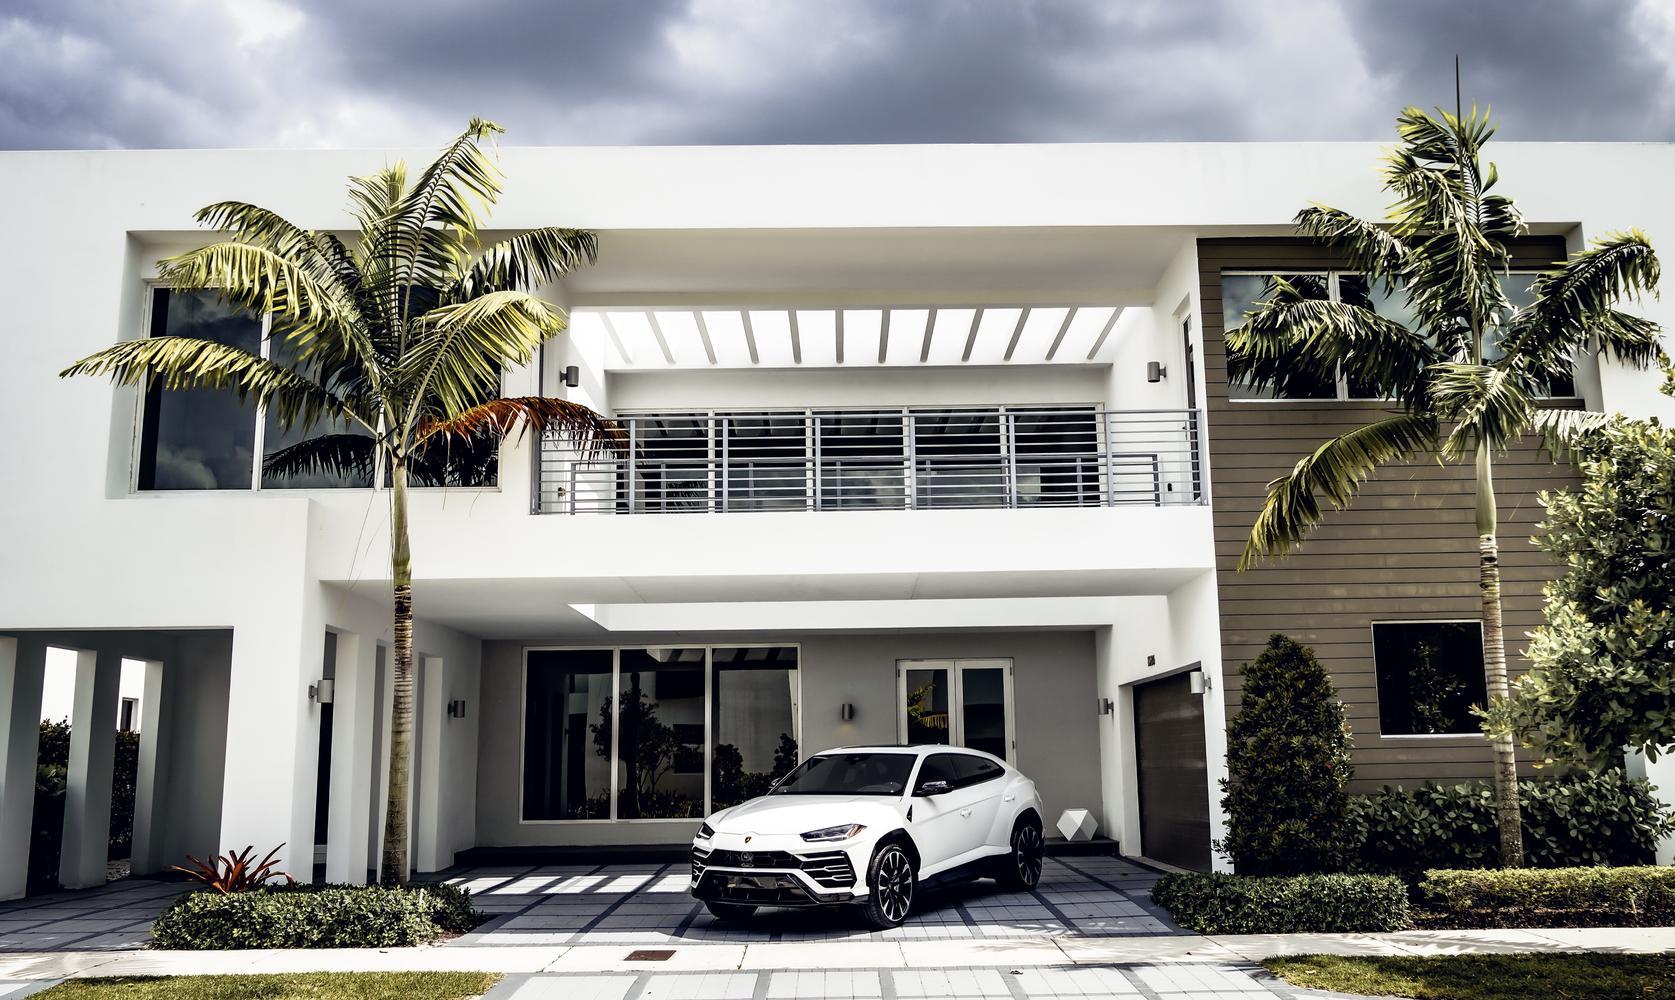 Image #3 of our  2021 LAMBORGHINI URUS - WHITE    In Miami Fort Lauderdale Palm Beach South Florida